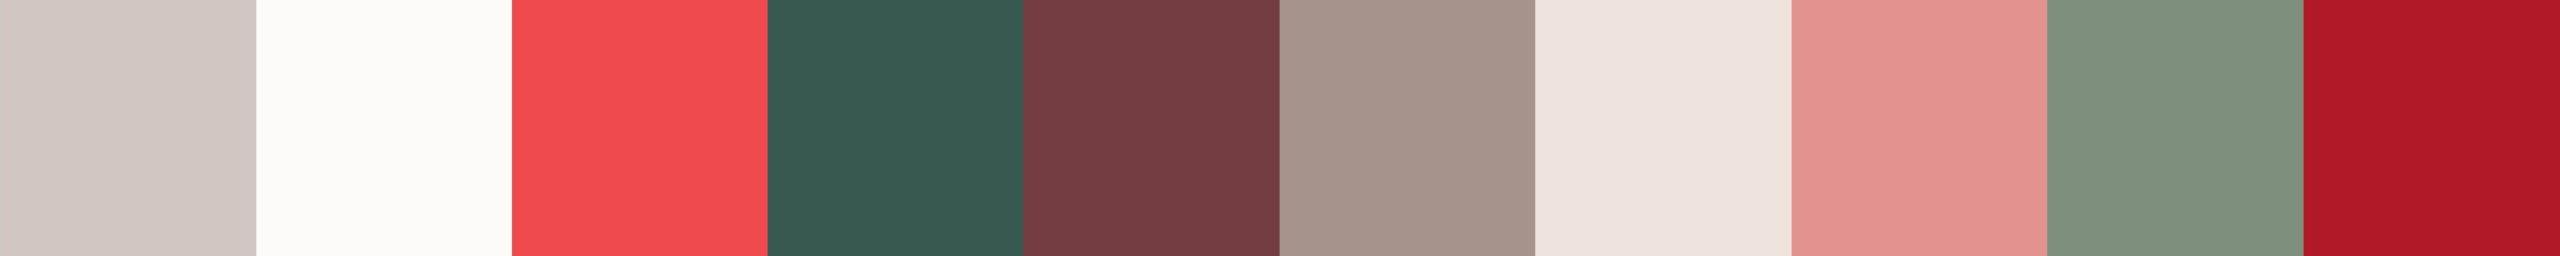 448 Anarma Color Palette